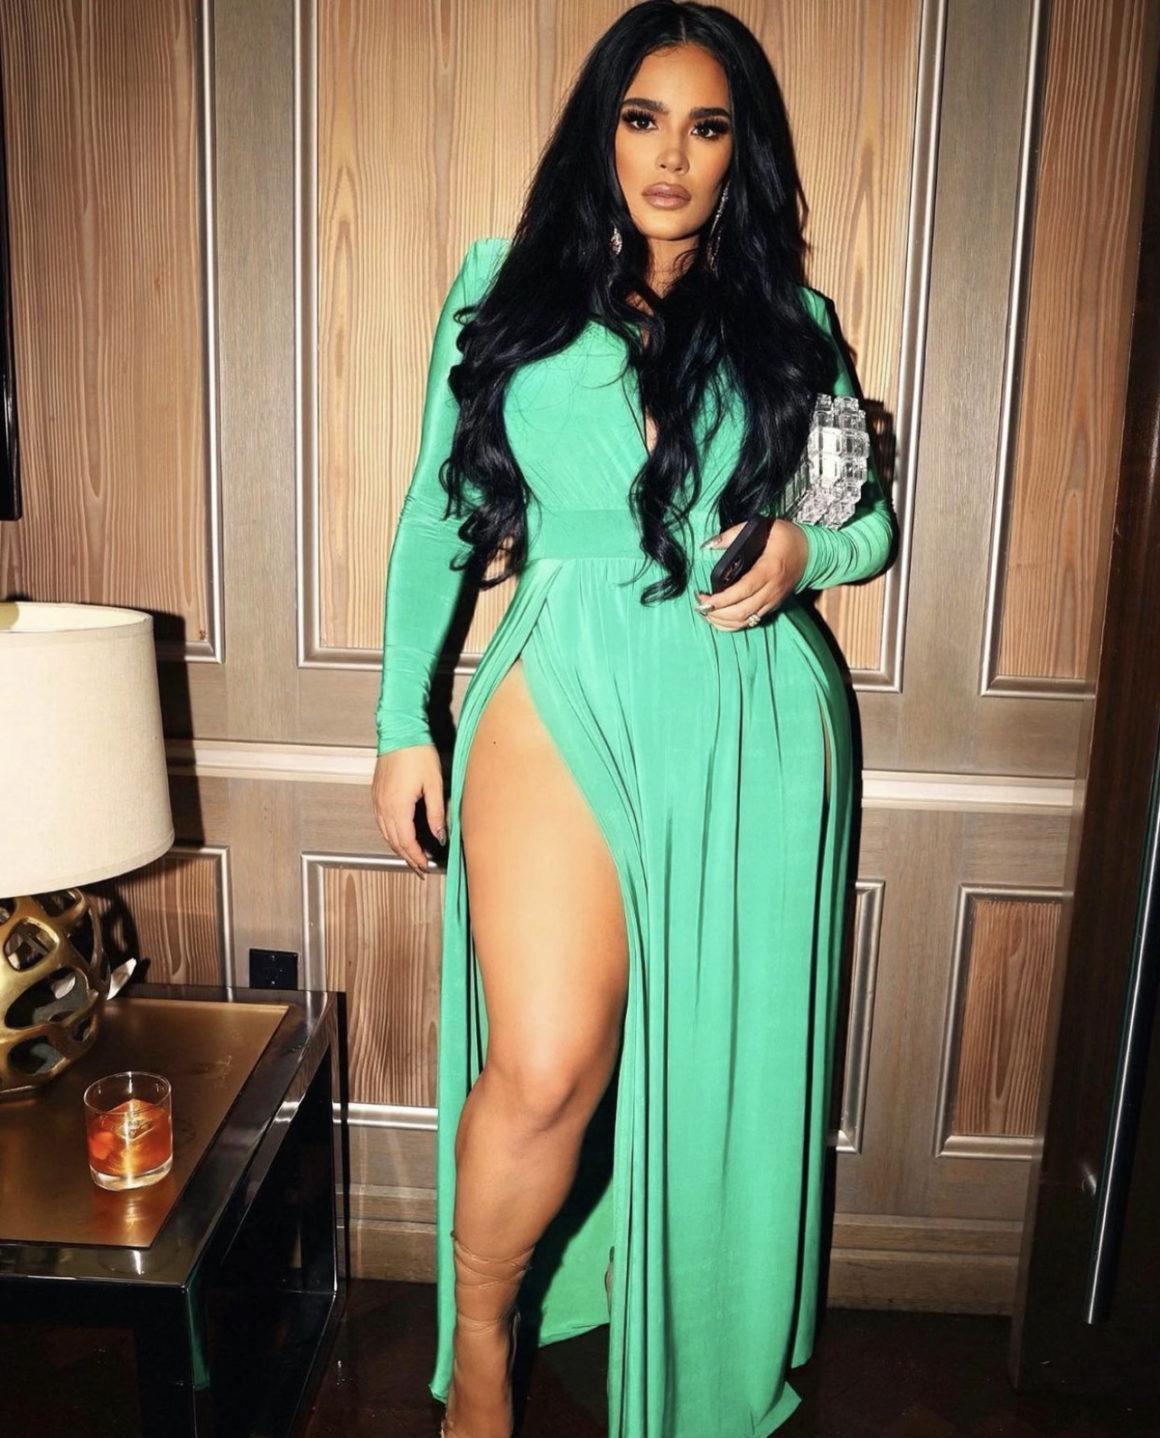 Emily B Rocks Fashion Nova Green V-Neck Maxi Dress to Jay-Z's 40/40 Club Anniversary Party